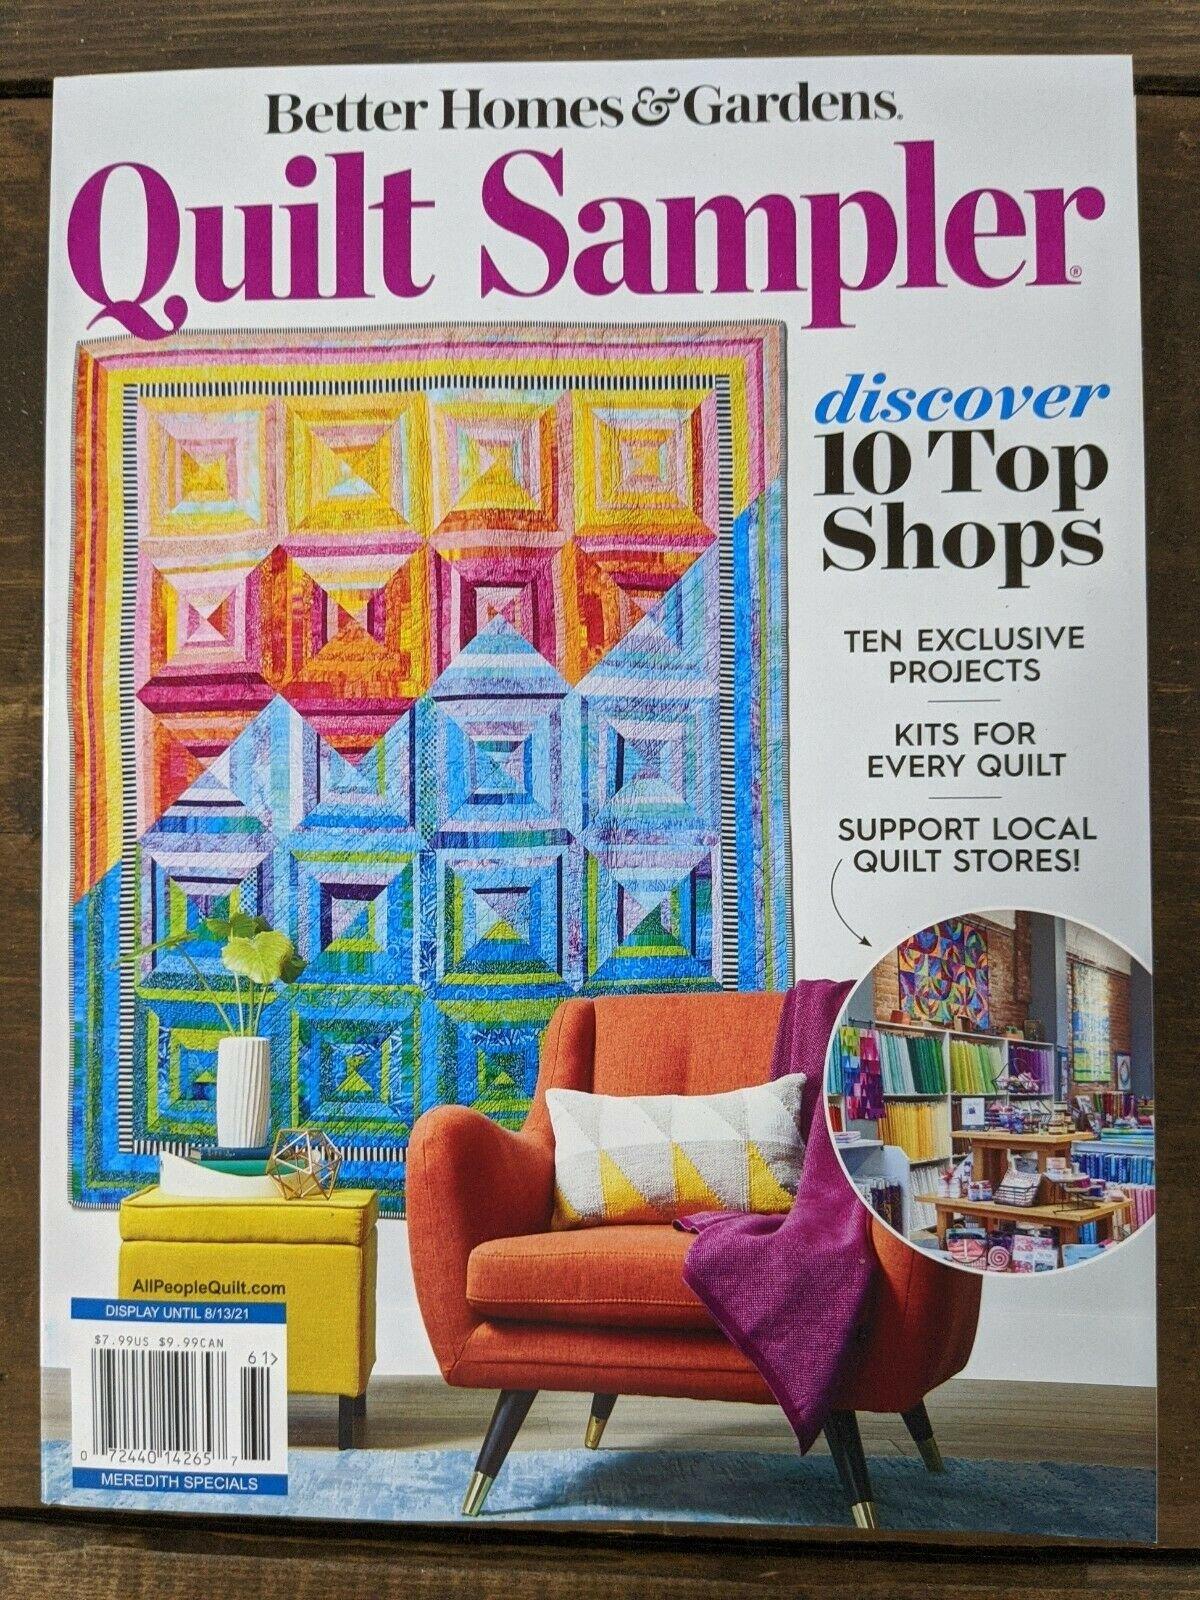 Quilt Sampler Spring/Summer 2021 Magazine